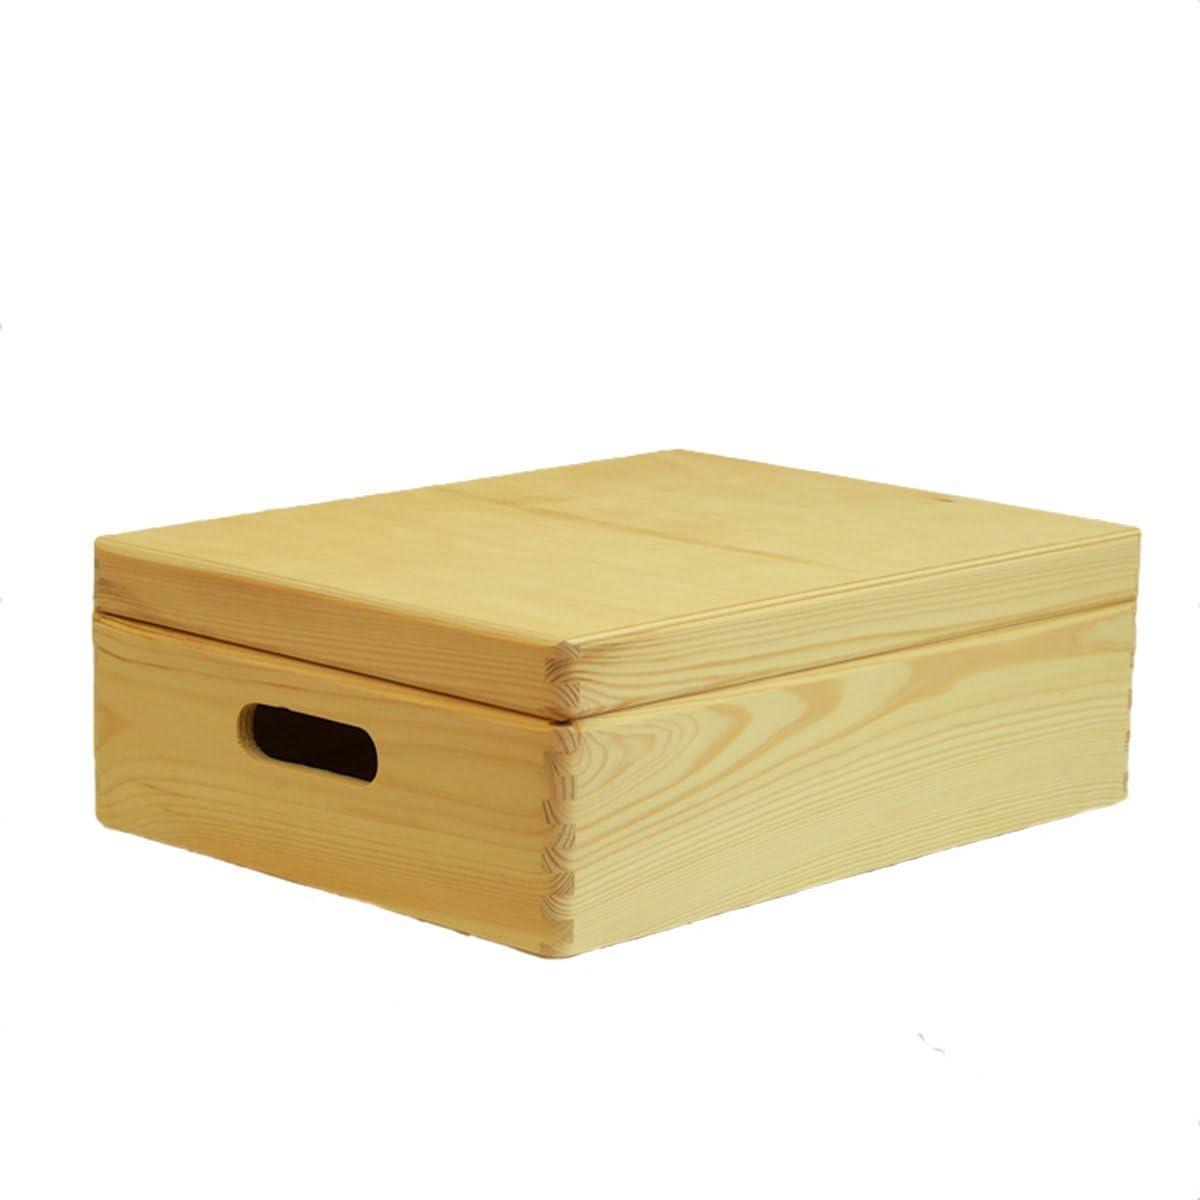 Compactor ran6480 Caja con Tapa, Madera sin Tratar, 40 x 30 x 14 cm: Amazon.es: Hogar